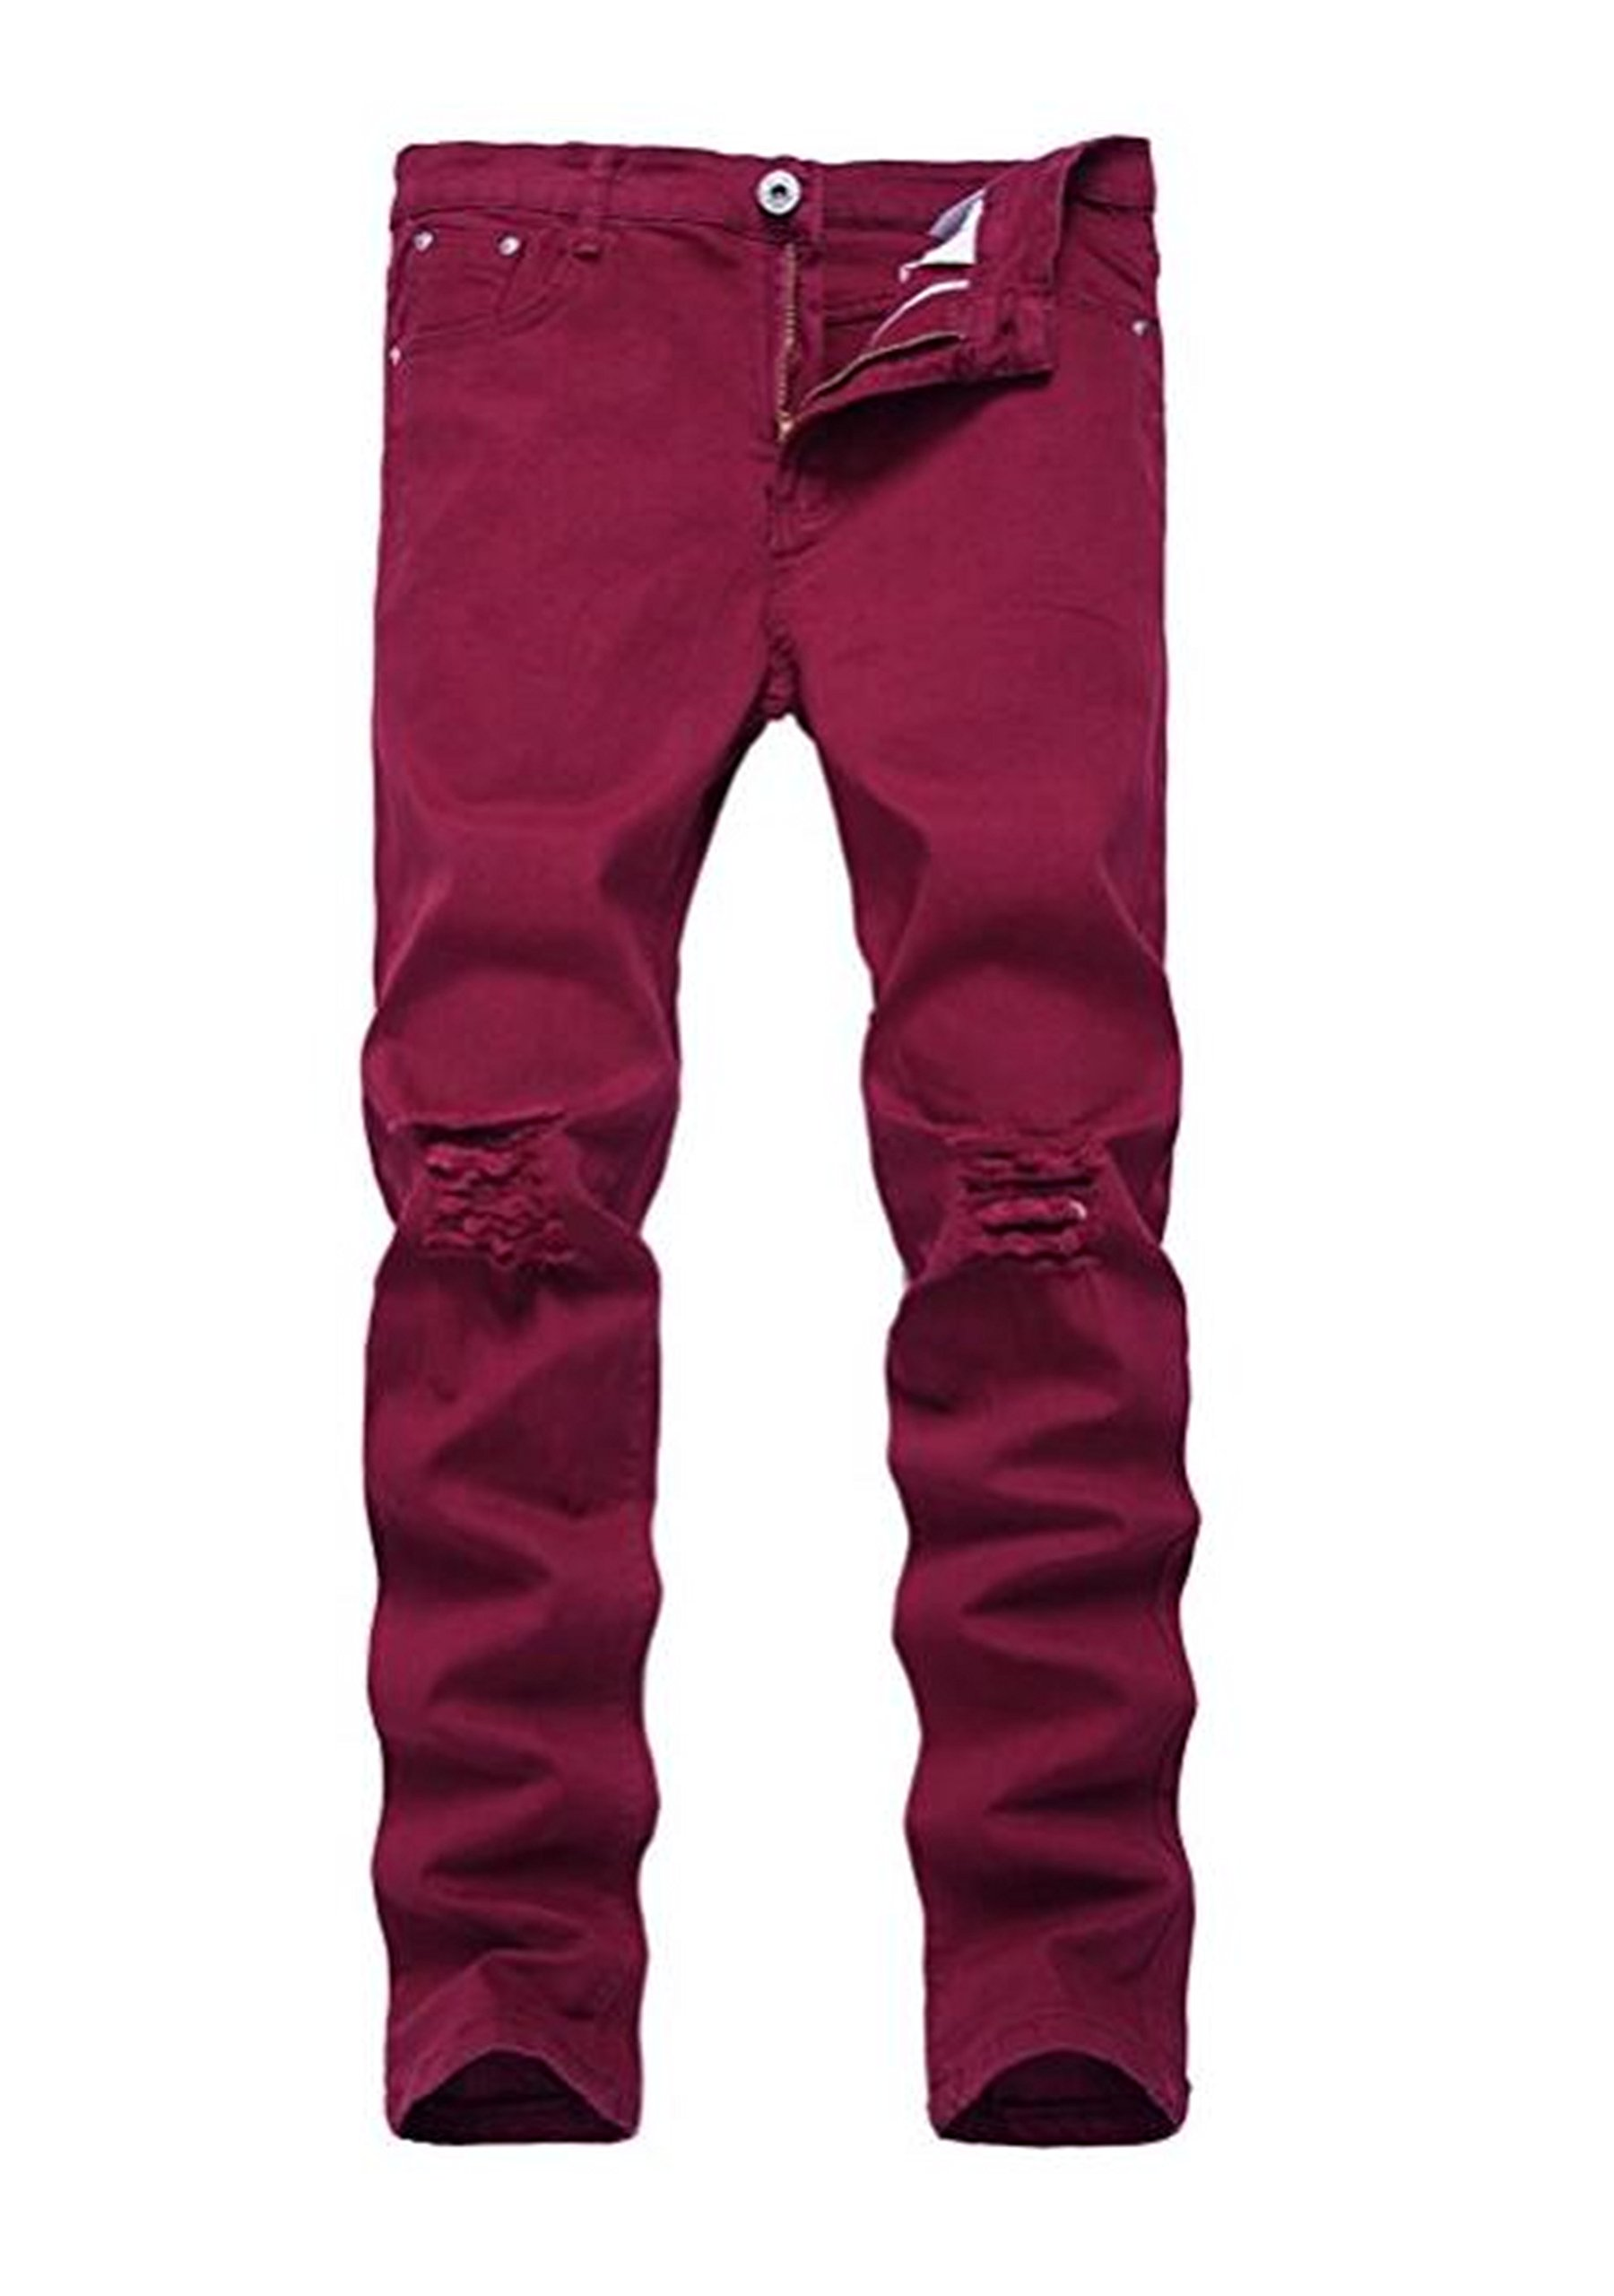 OBT Boy's Wine Red Stretch Skinny Fit Ripped Destroyed Distressed Fashion Slim Denim Jeans 8